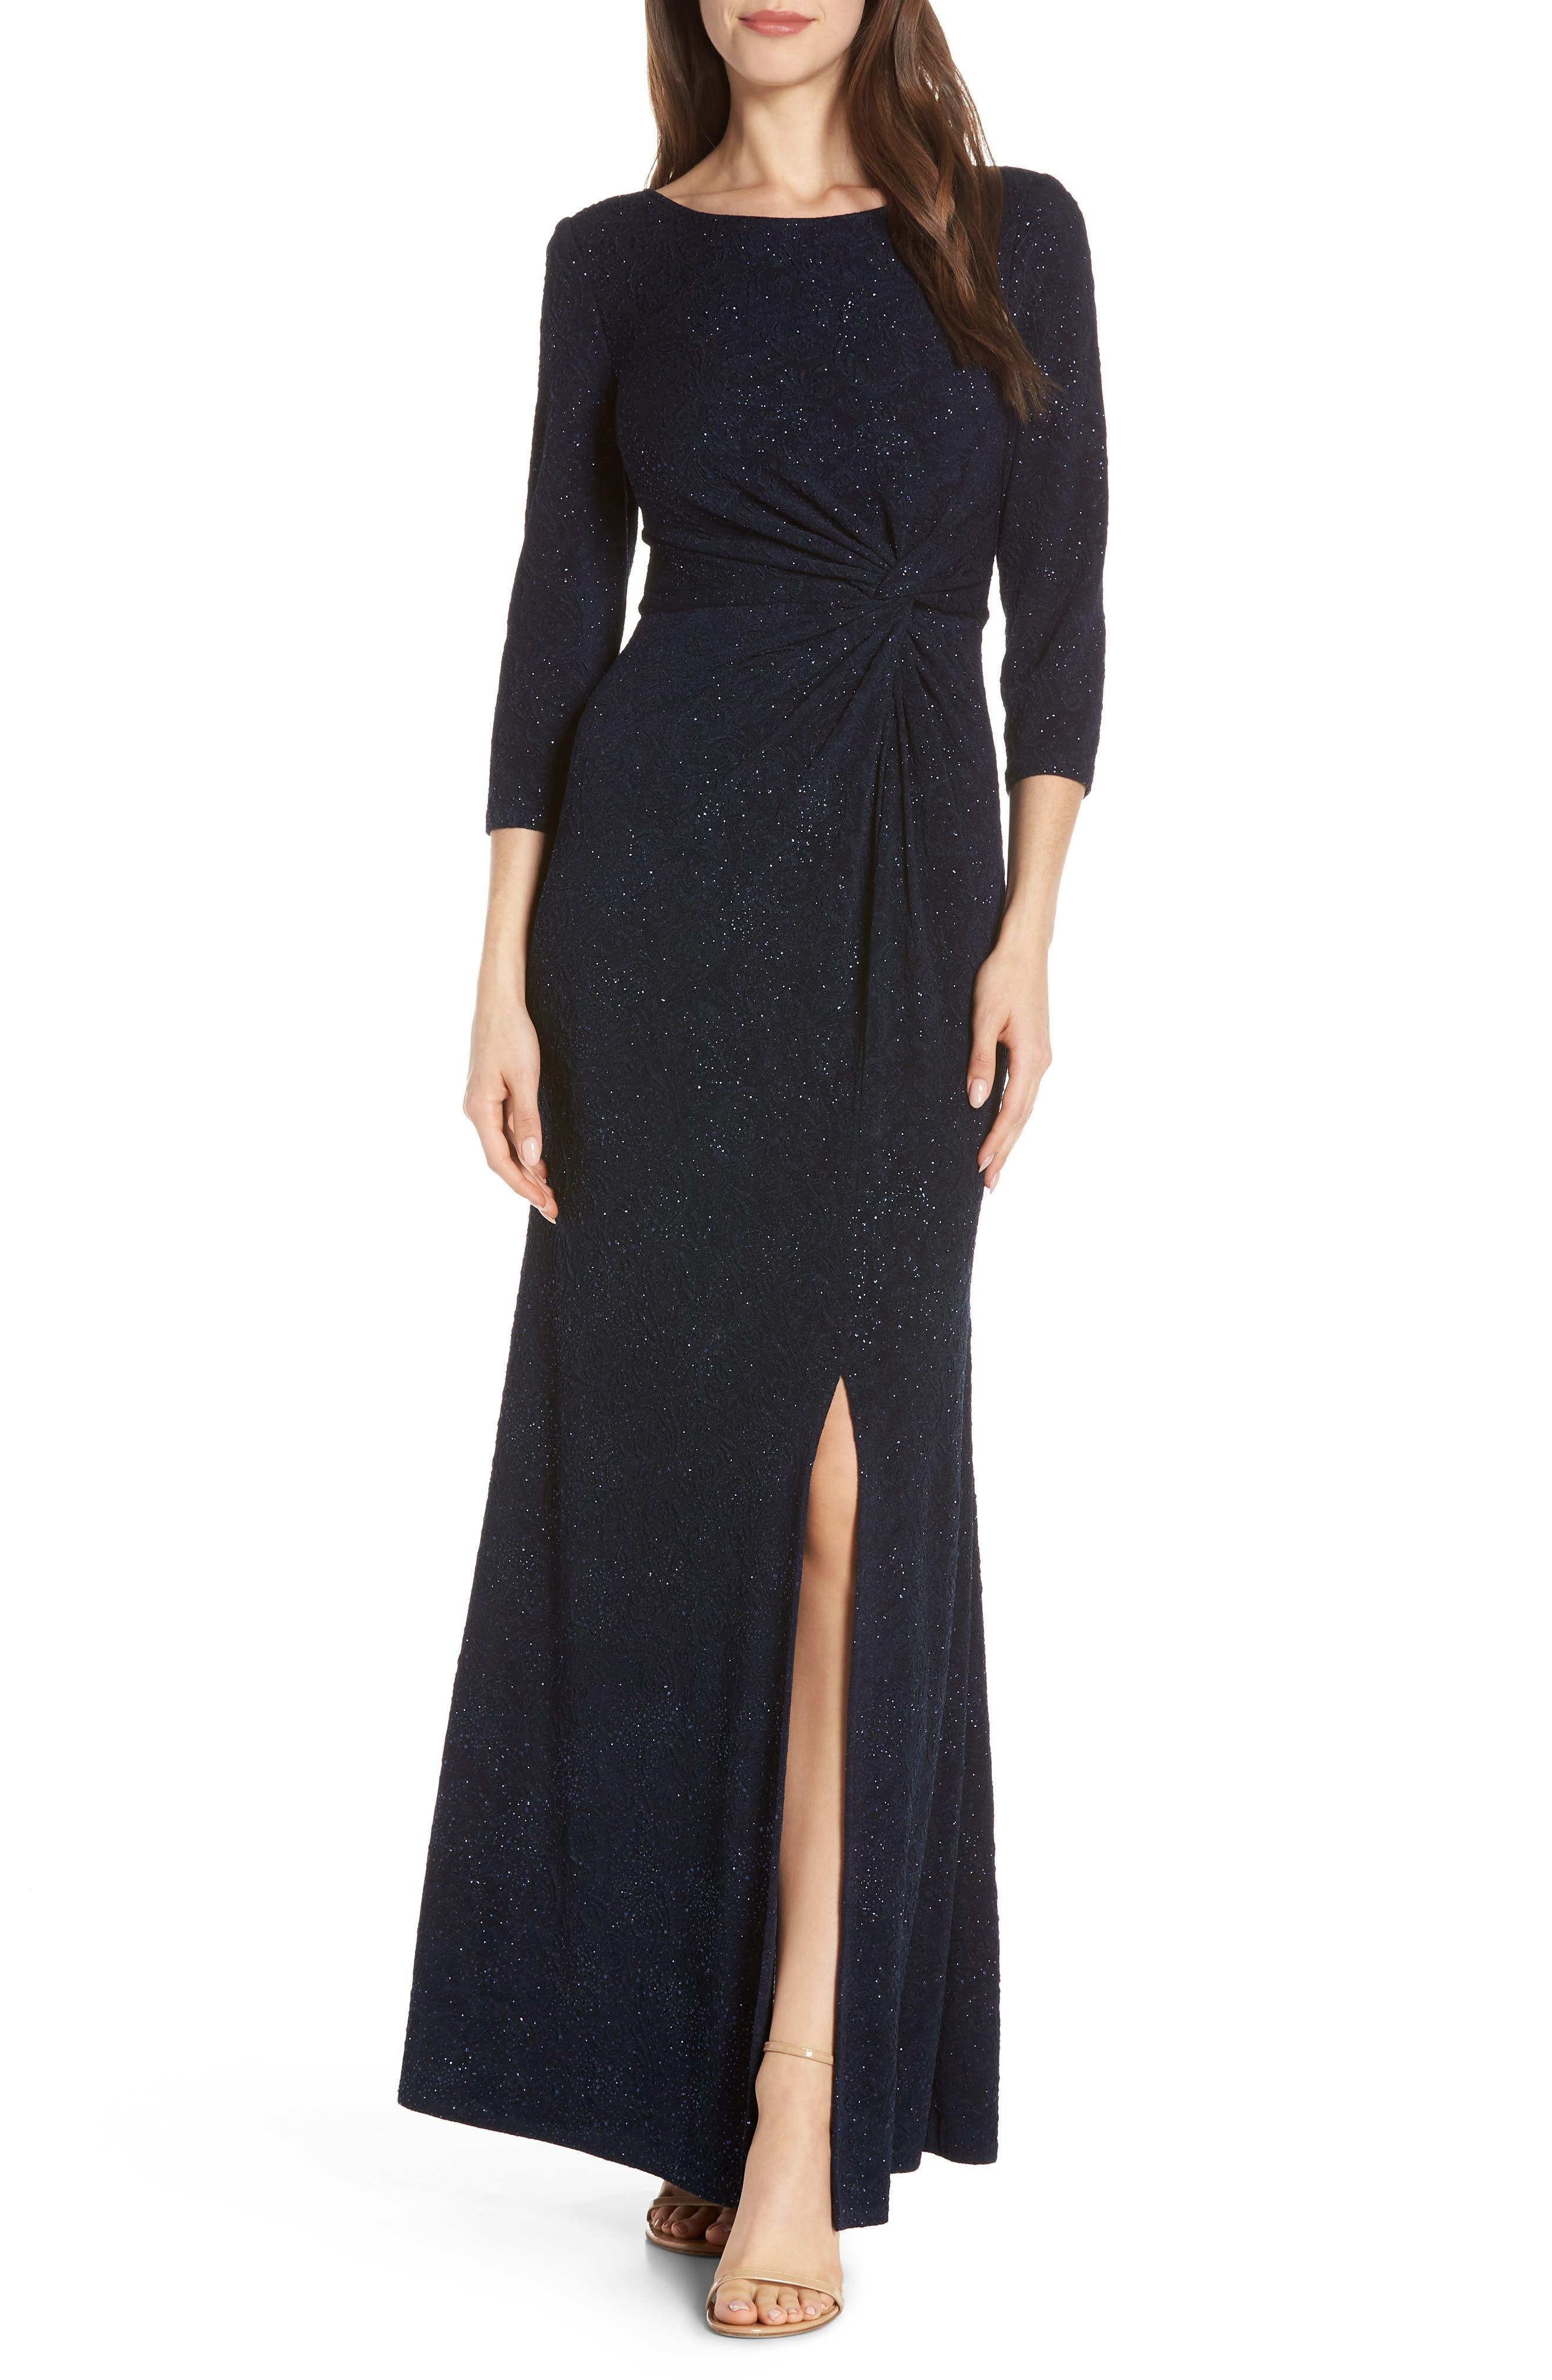 ALEX EVENINGS Knot Front Sequin Jacquard Evening Dress, Main, color, NAVY